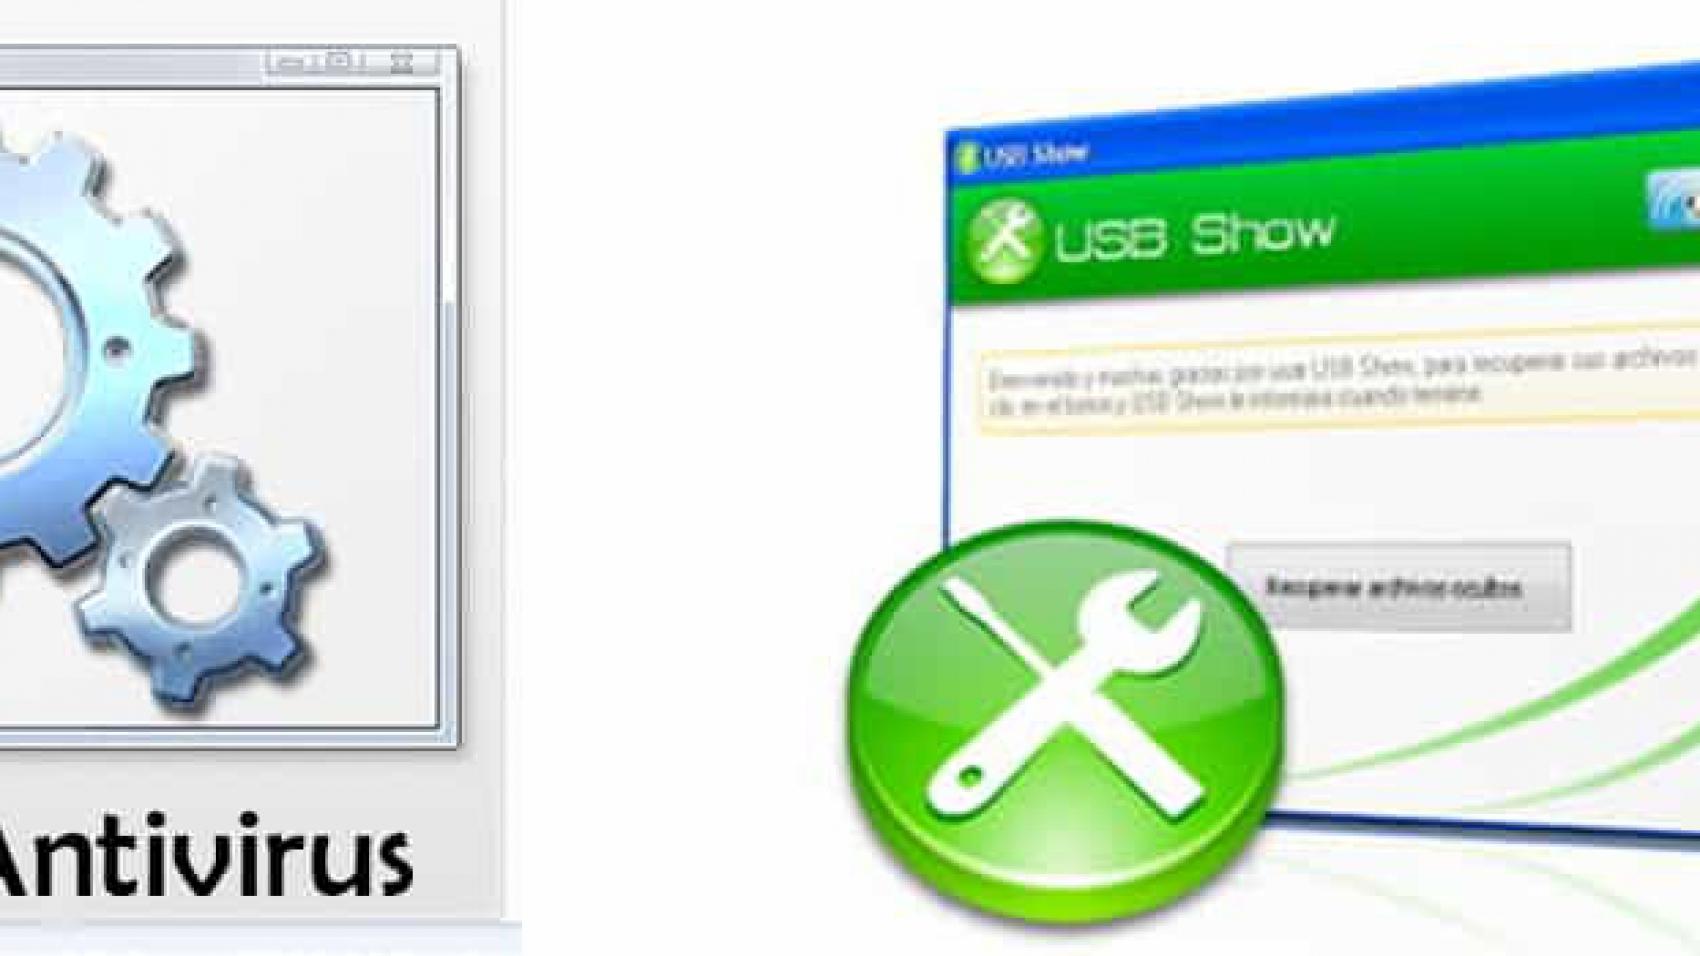 usb-show